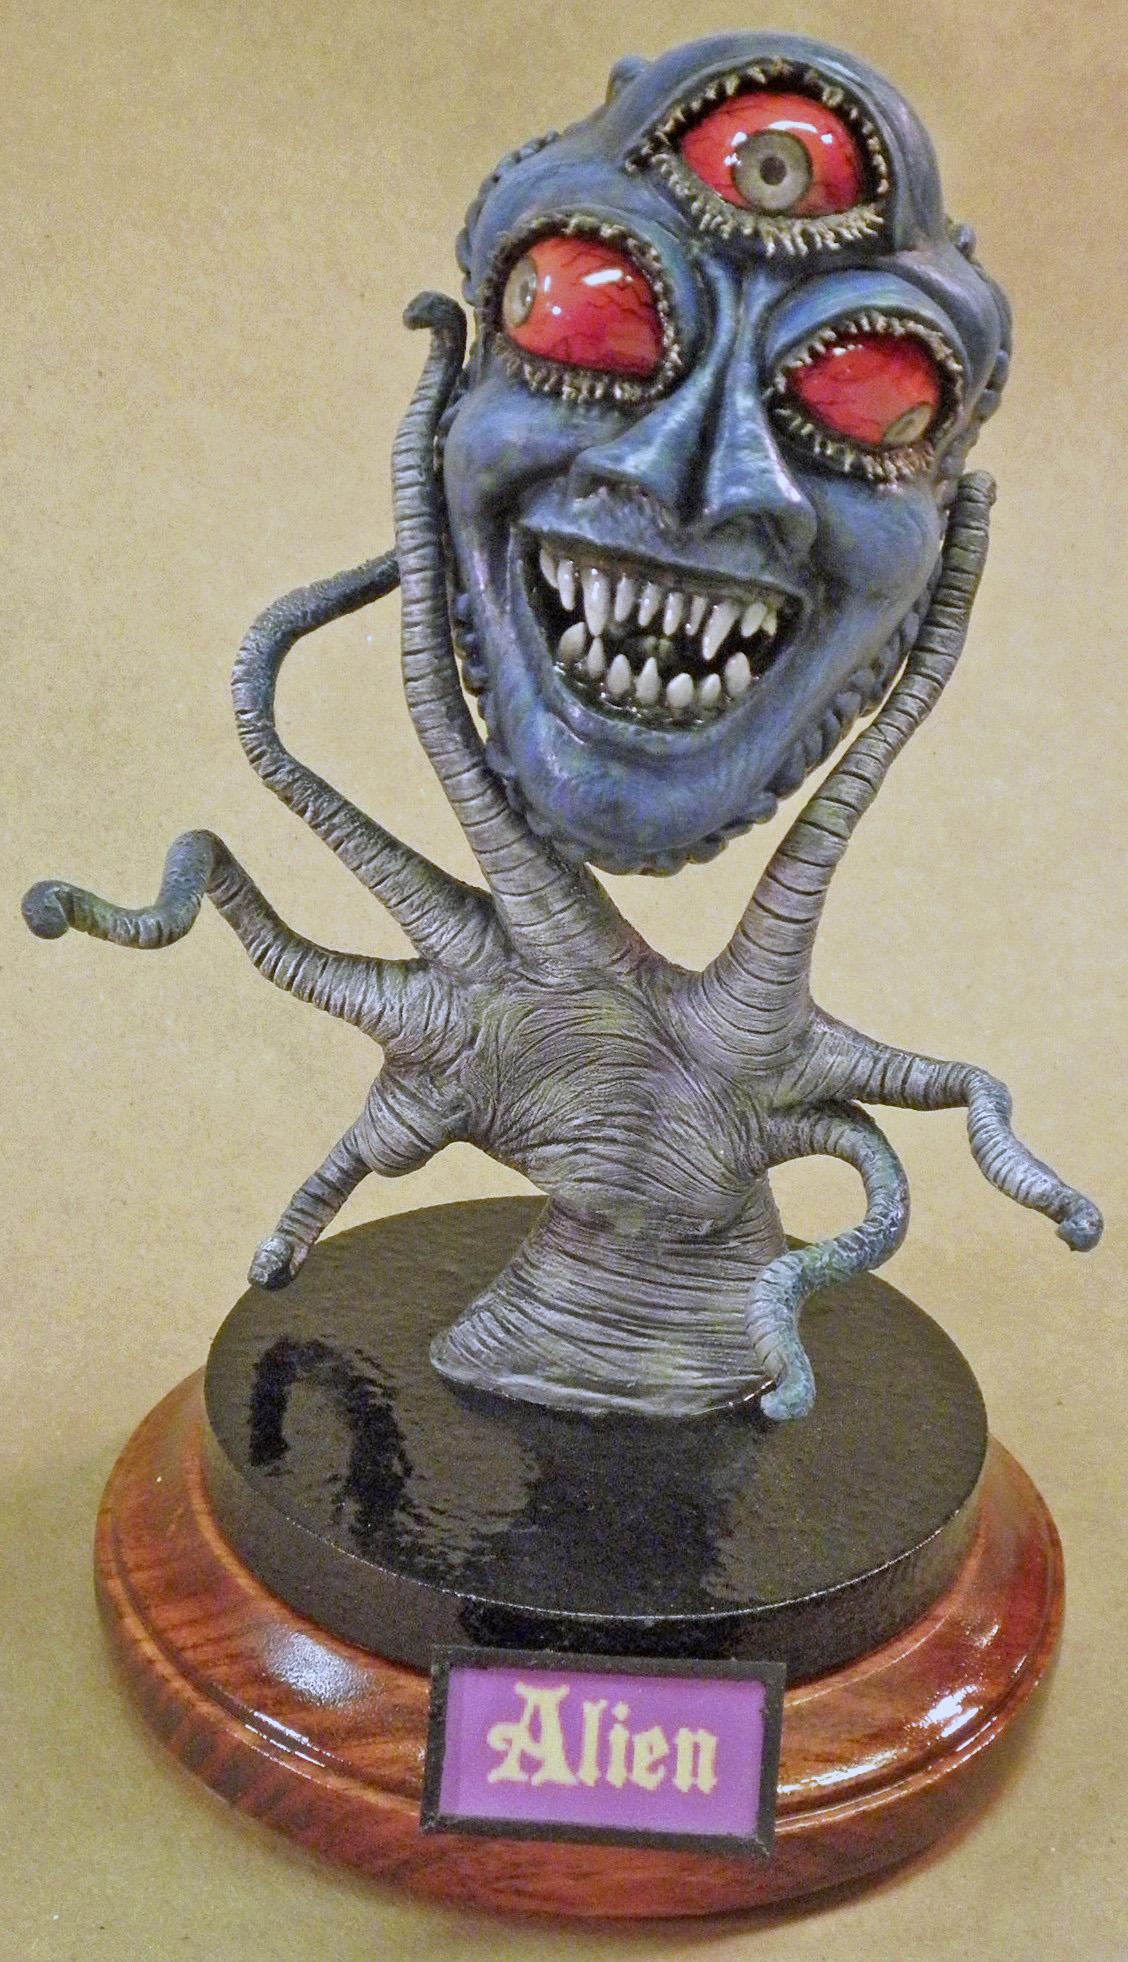 Haunted Glo-Heads!